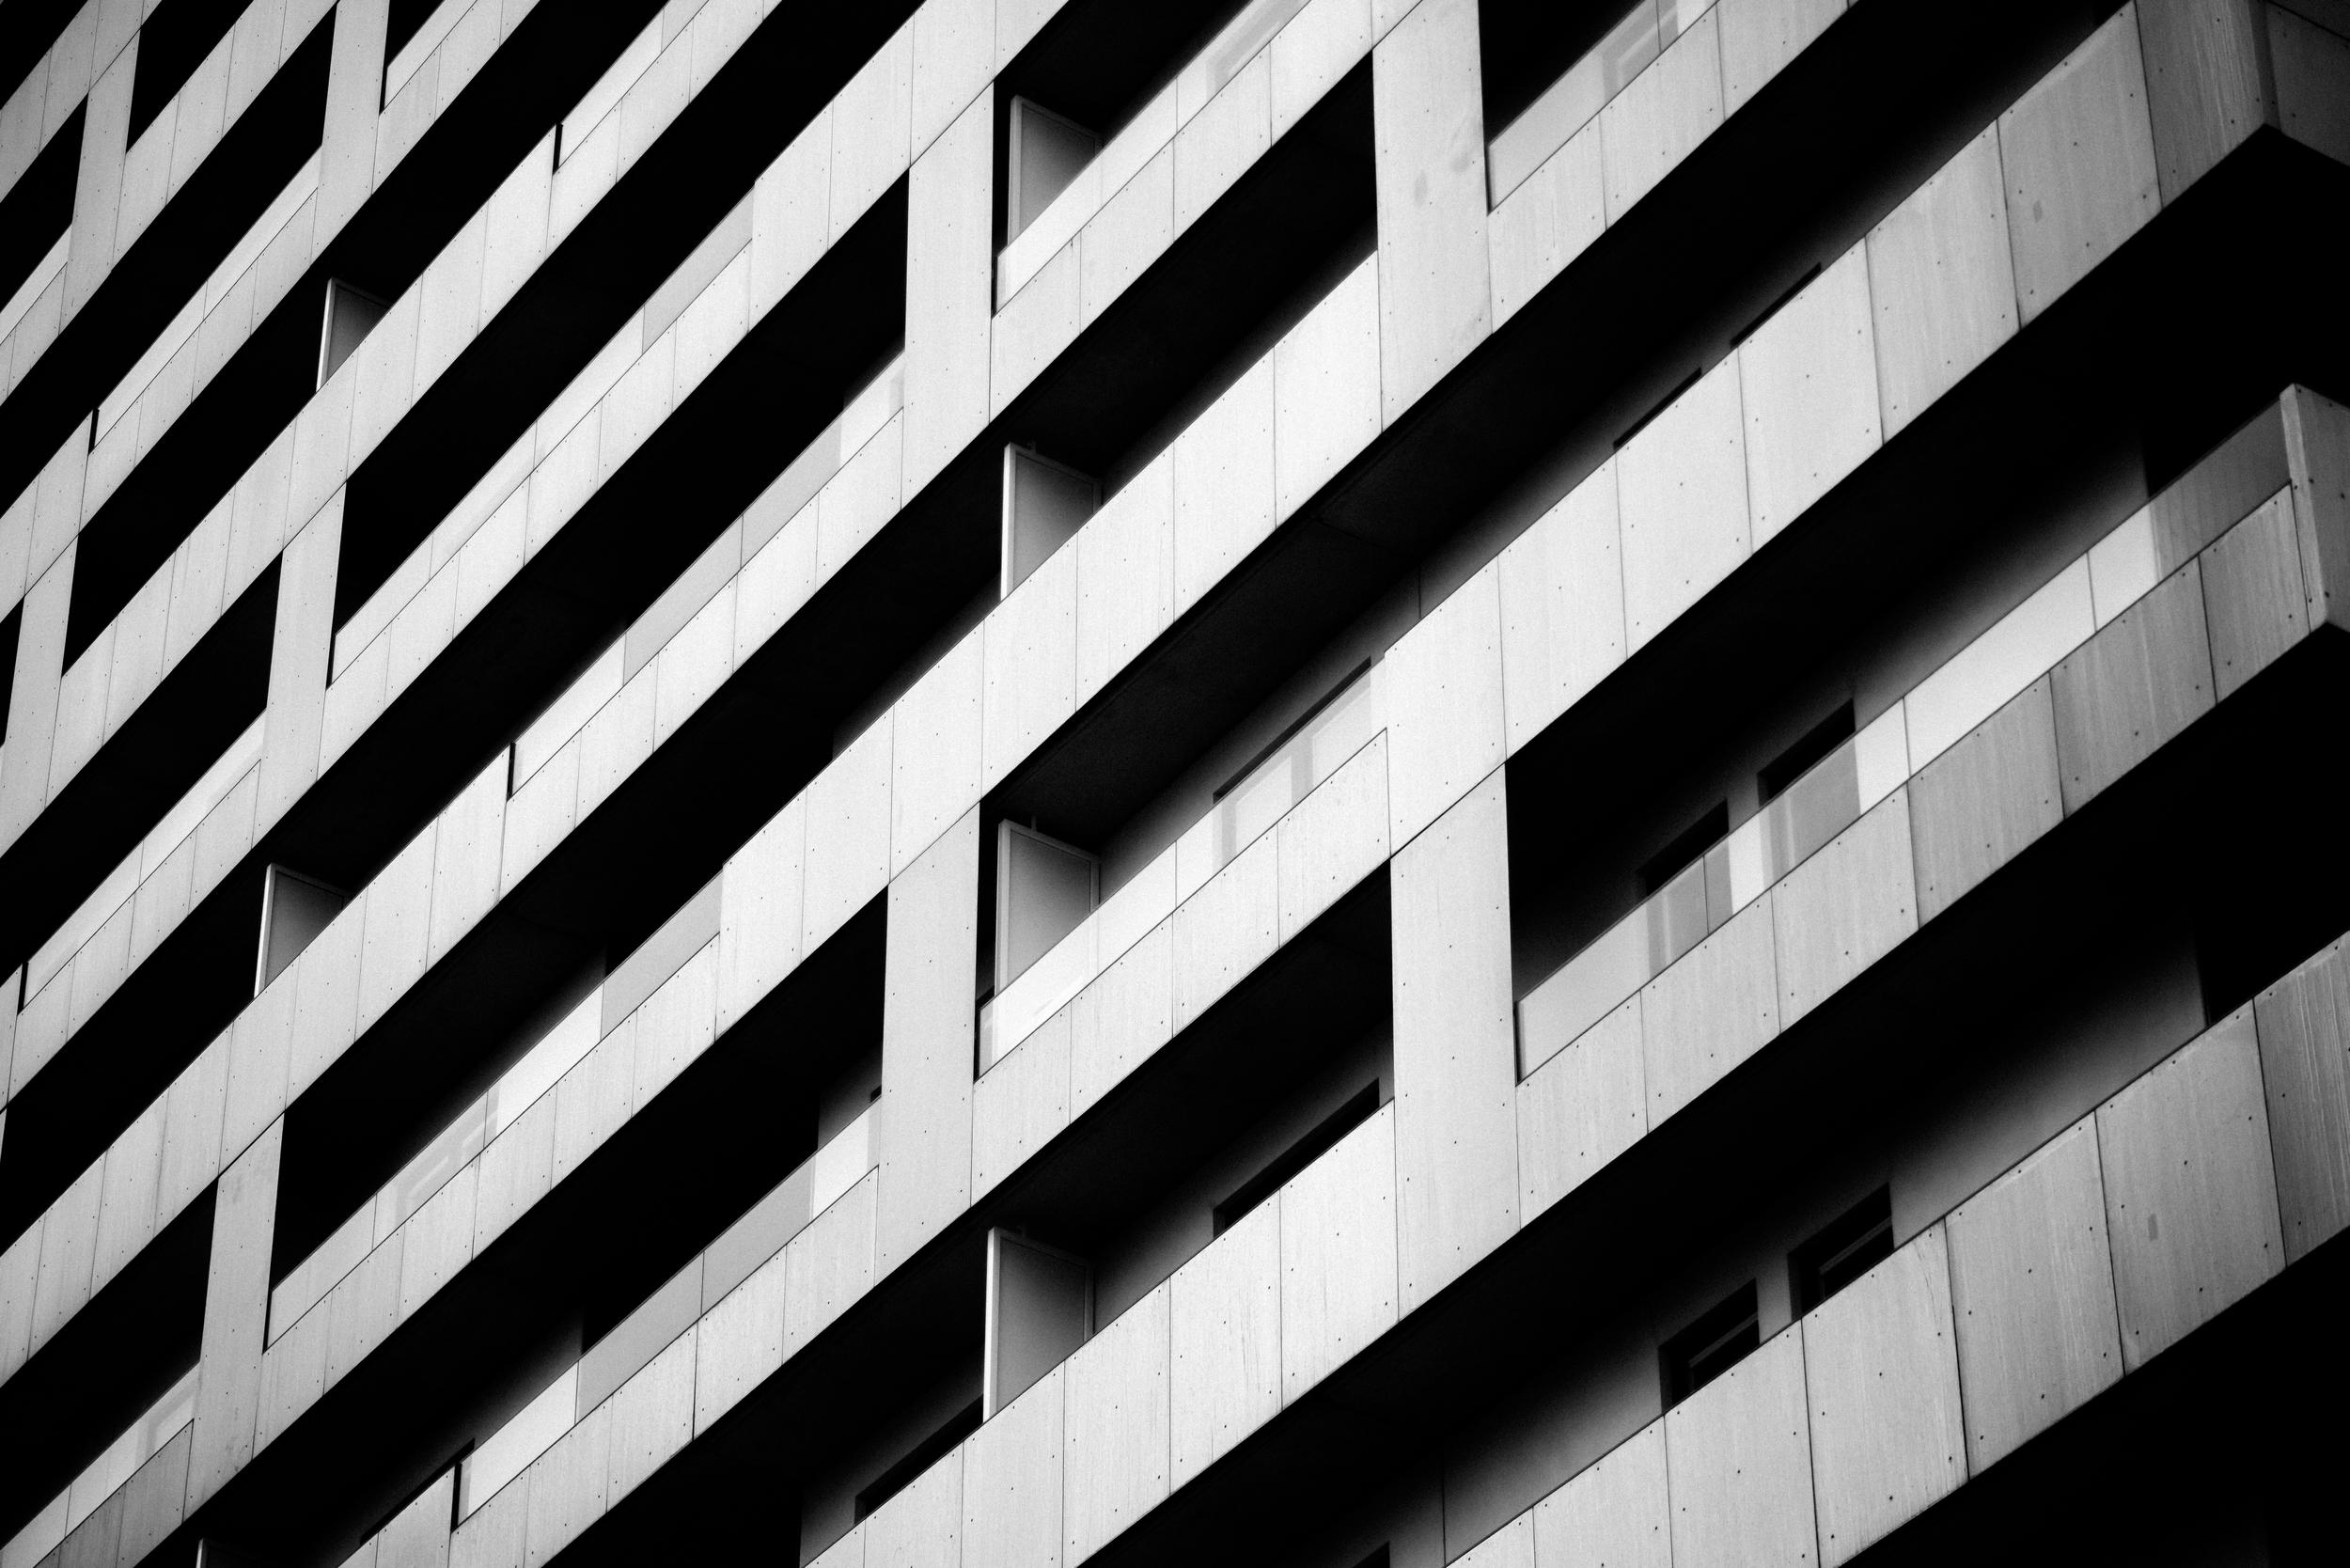 Apartment stripes, Kristineberg, Stockholm